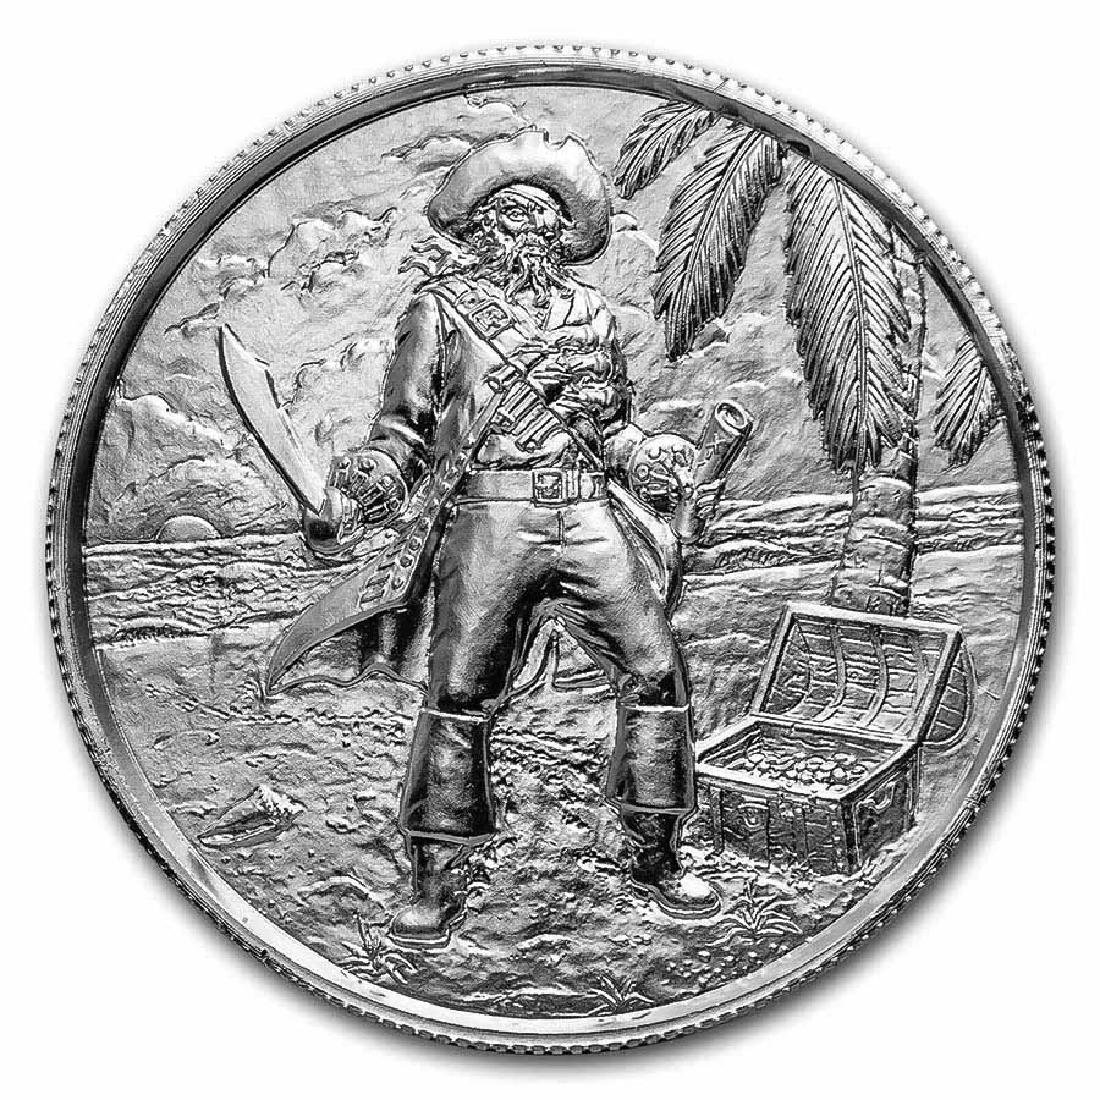 Elemetal Mint 2 oz High Relief Silver Round - The Capta